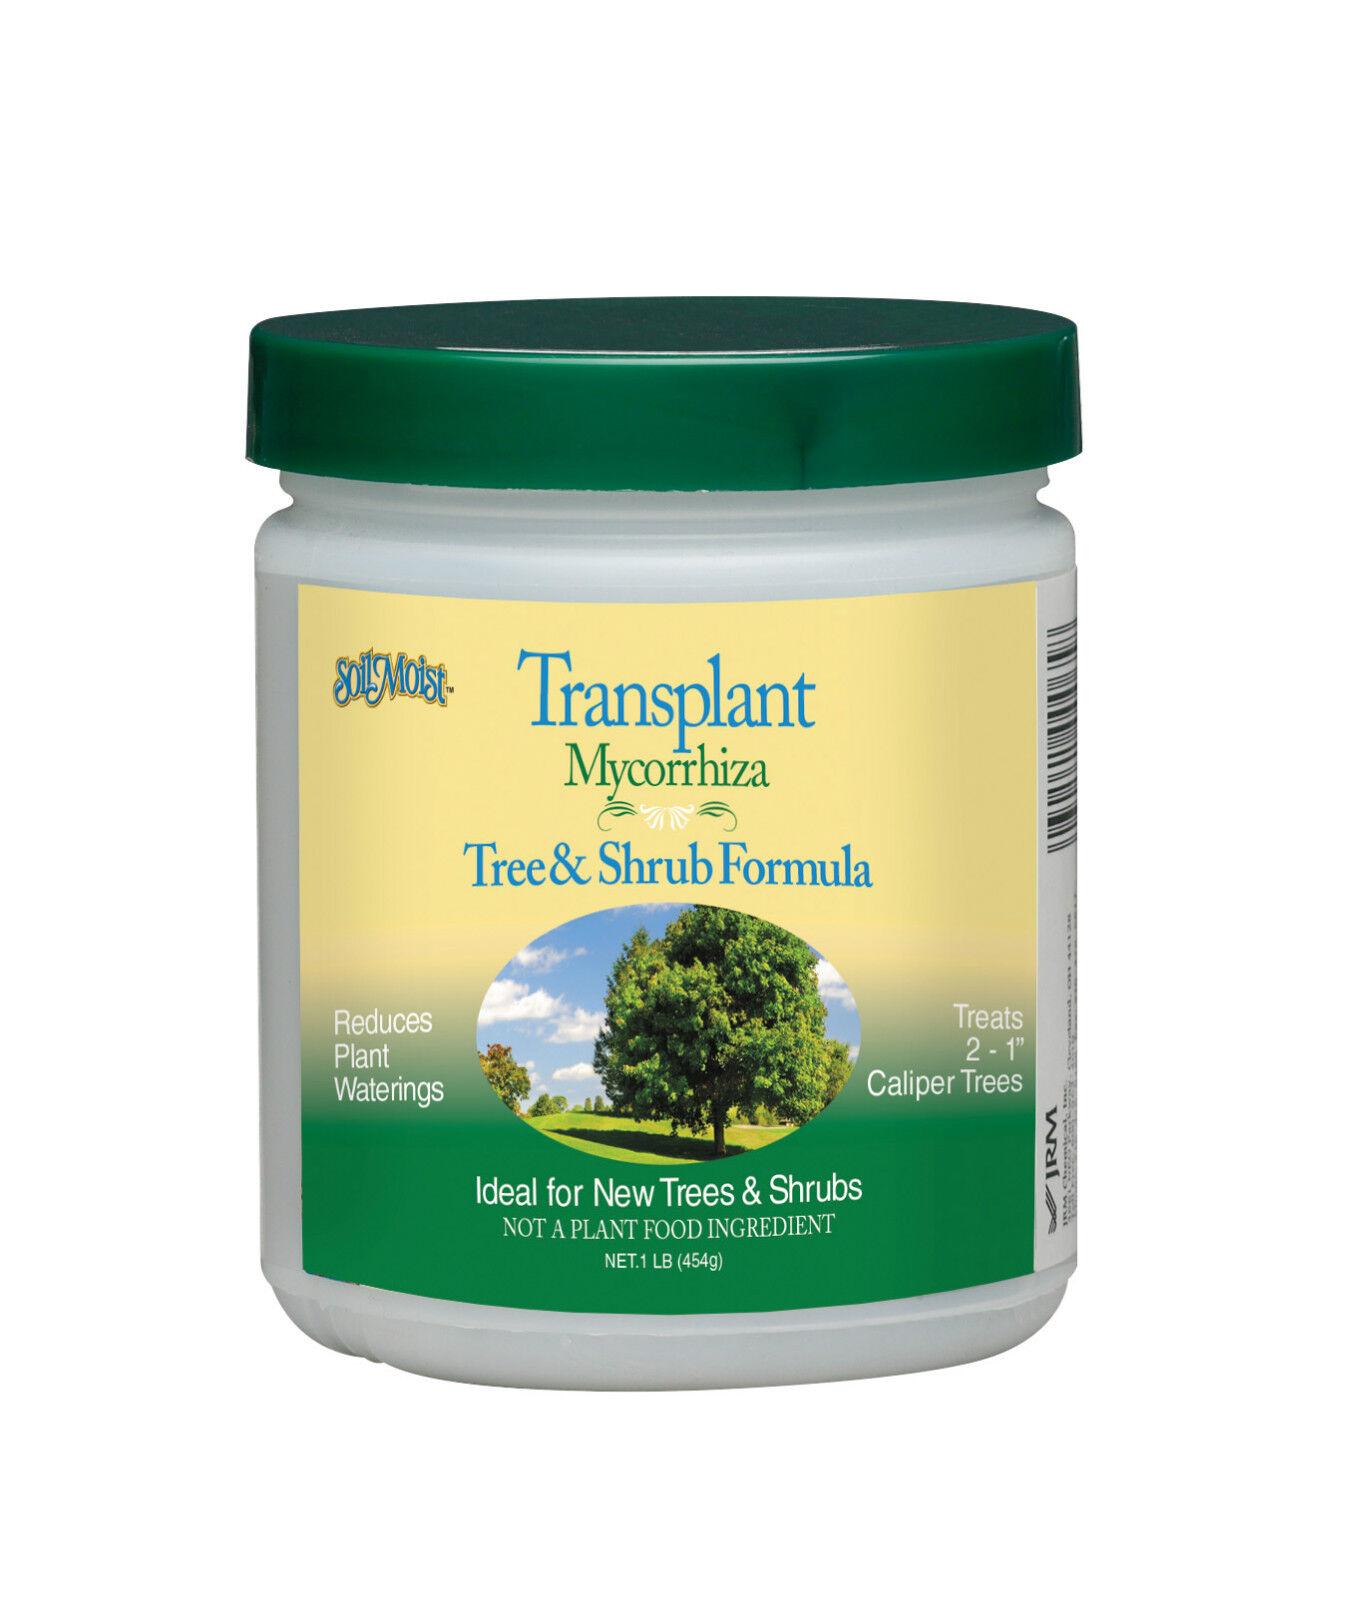 Soil Moist Transplant Mycorrhizal Tree Shrub Formula 1lb Jar Water Saving Mix